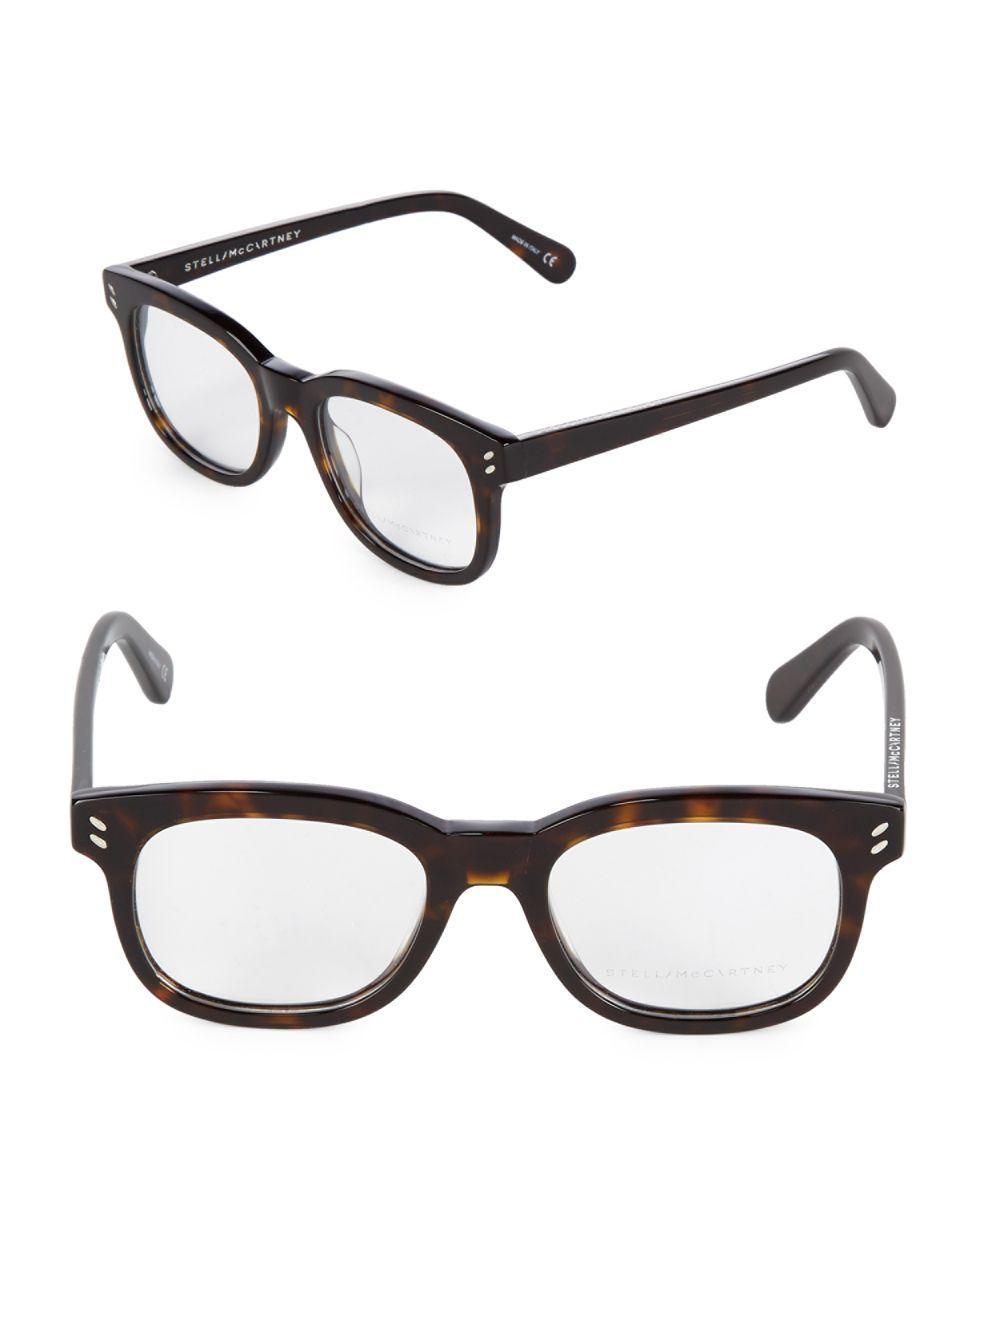 ba05f5dce8 Stella McCartney 50mm Tortoise Shell Optical Glasses in Brown - Lyst